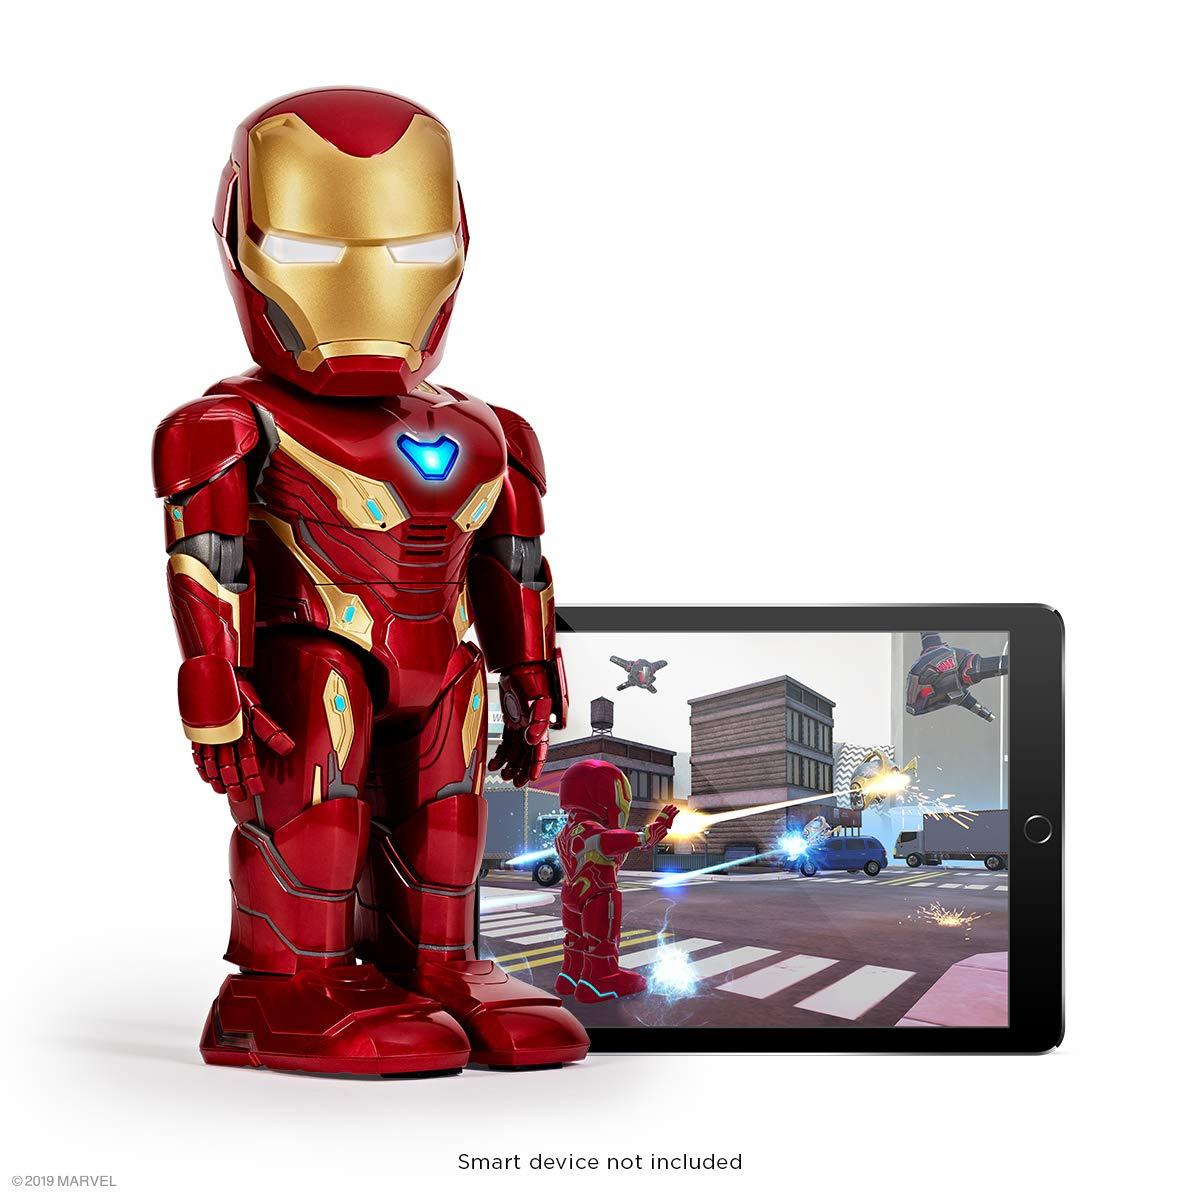 UBTECH Marvel Avengers: Endgame Iron Man Mk50 Robot by UBTECH (Image #4)